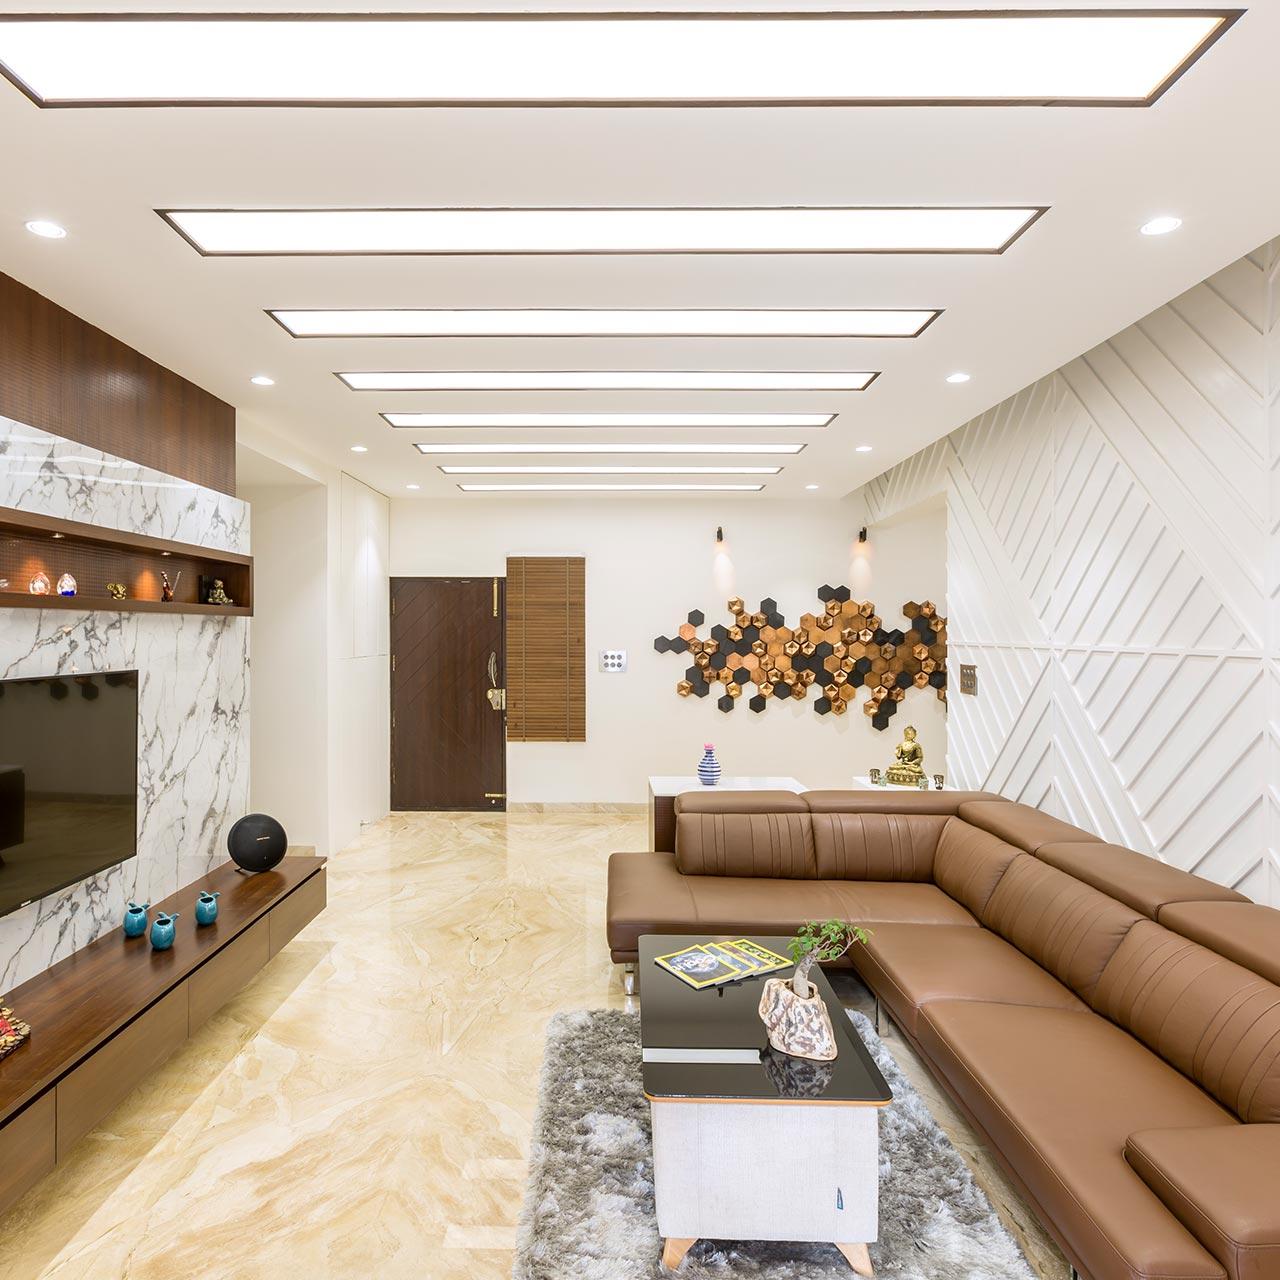 Interior Designer Or Decorator, Make Your Choice